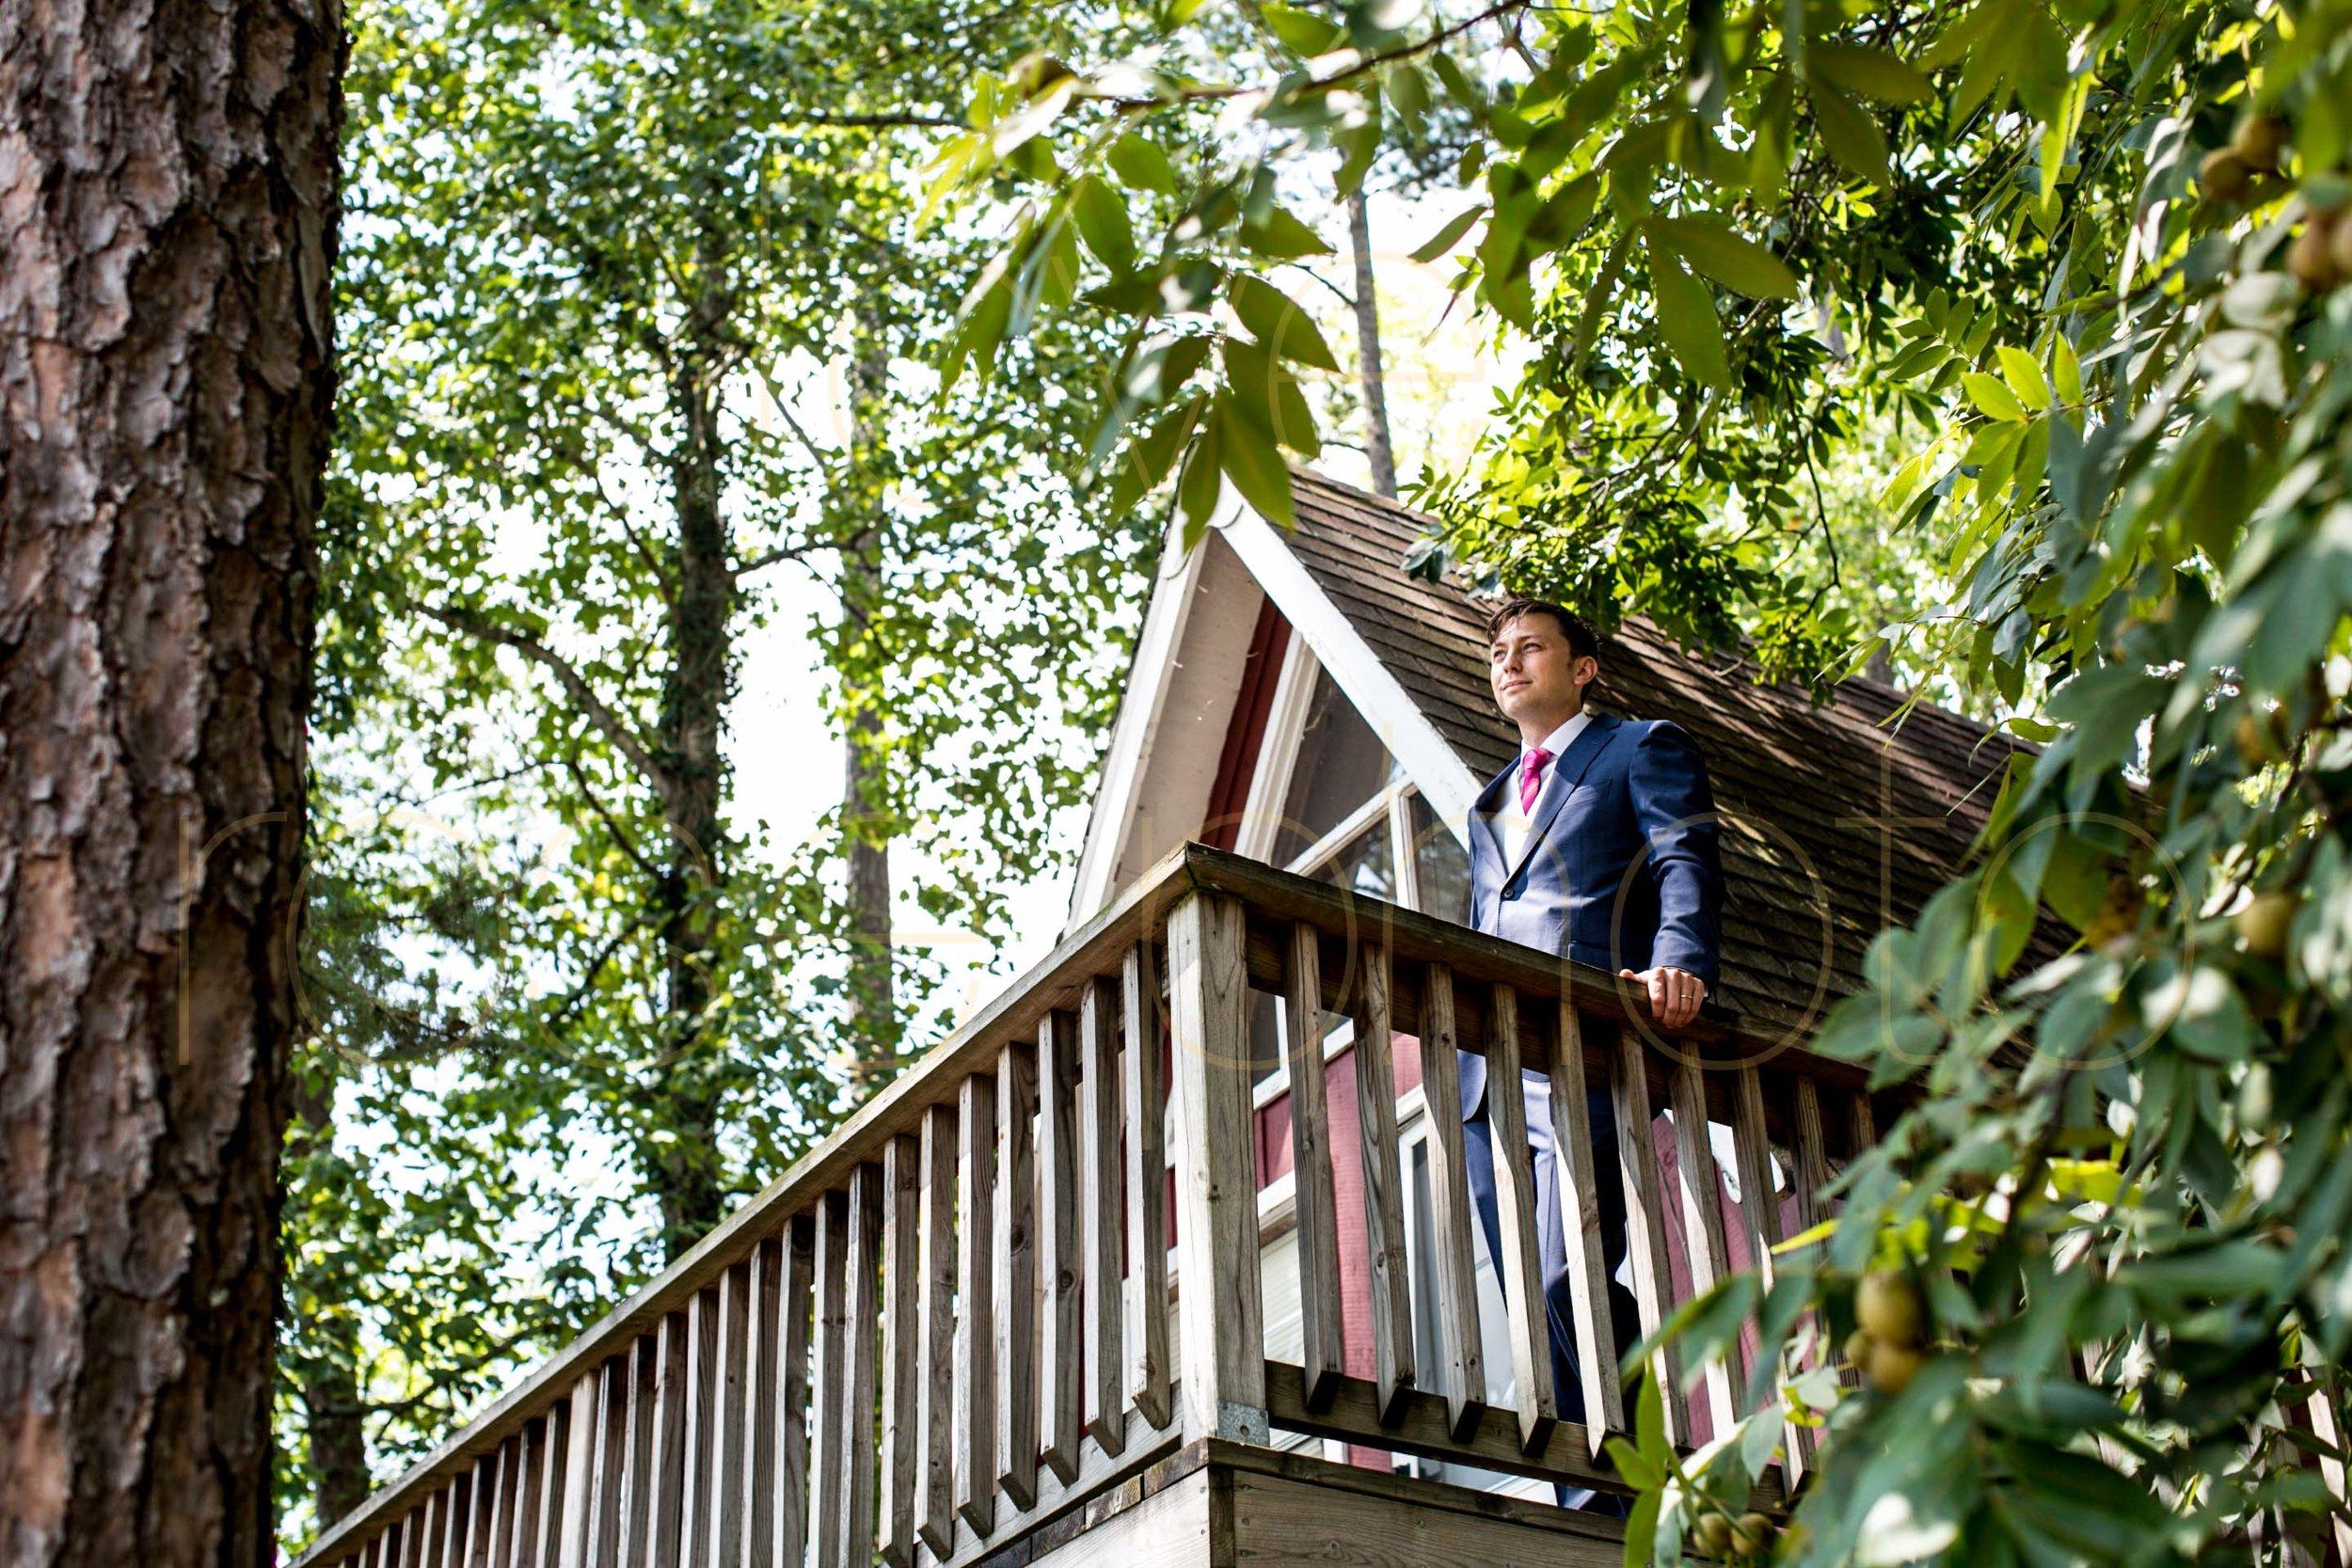 Rose Photo Asheville Wedding Photographer Nasheville Weddings Charleston Bride Chicago photojournalist weddings -8.jpg